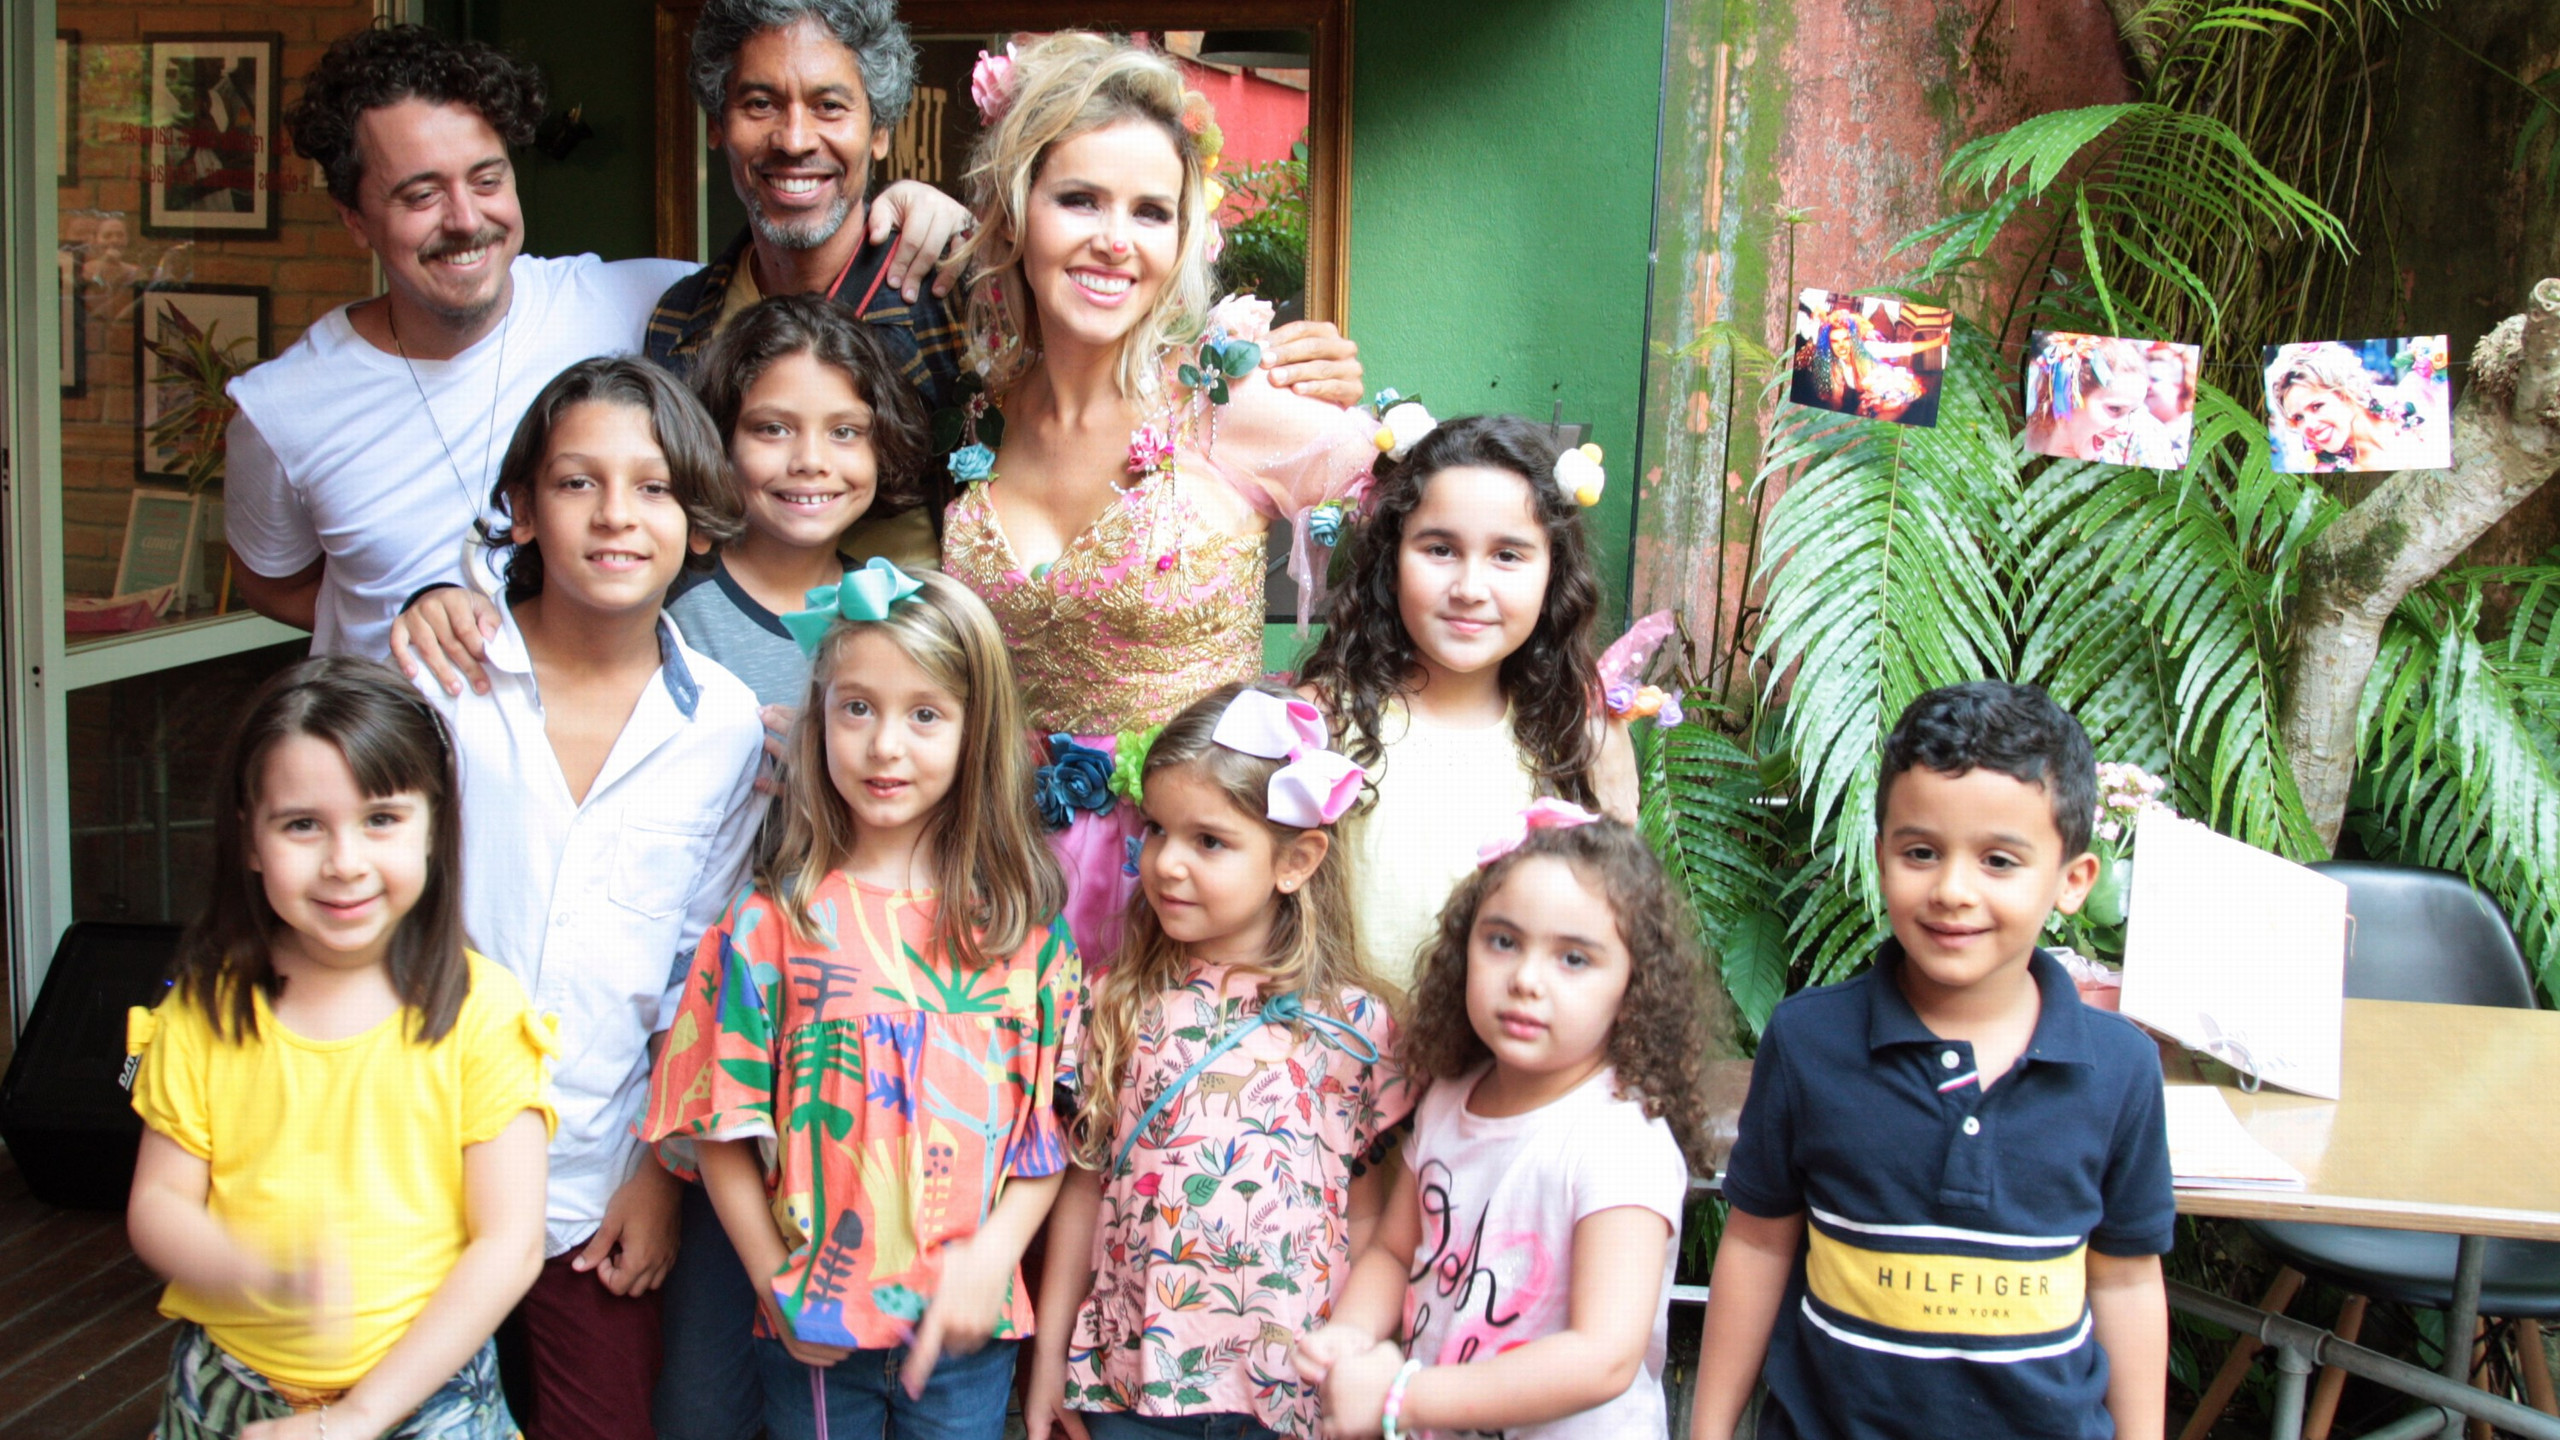 Ramon Nunes Mello,Celso Lira e Celso Lira e Leona Cavalli